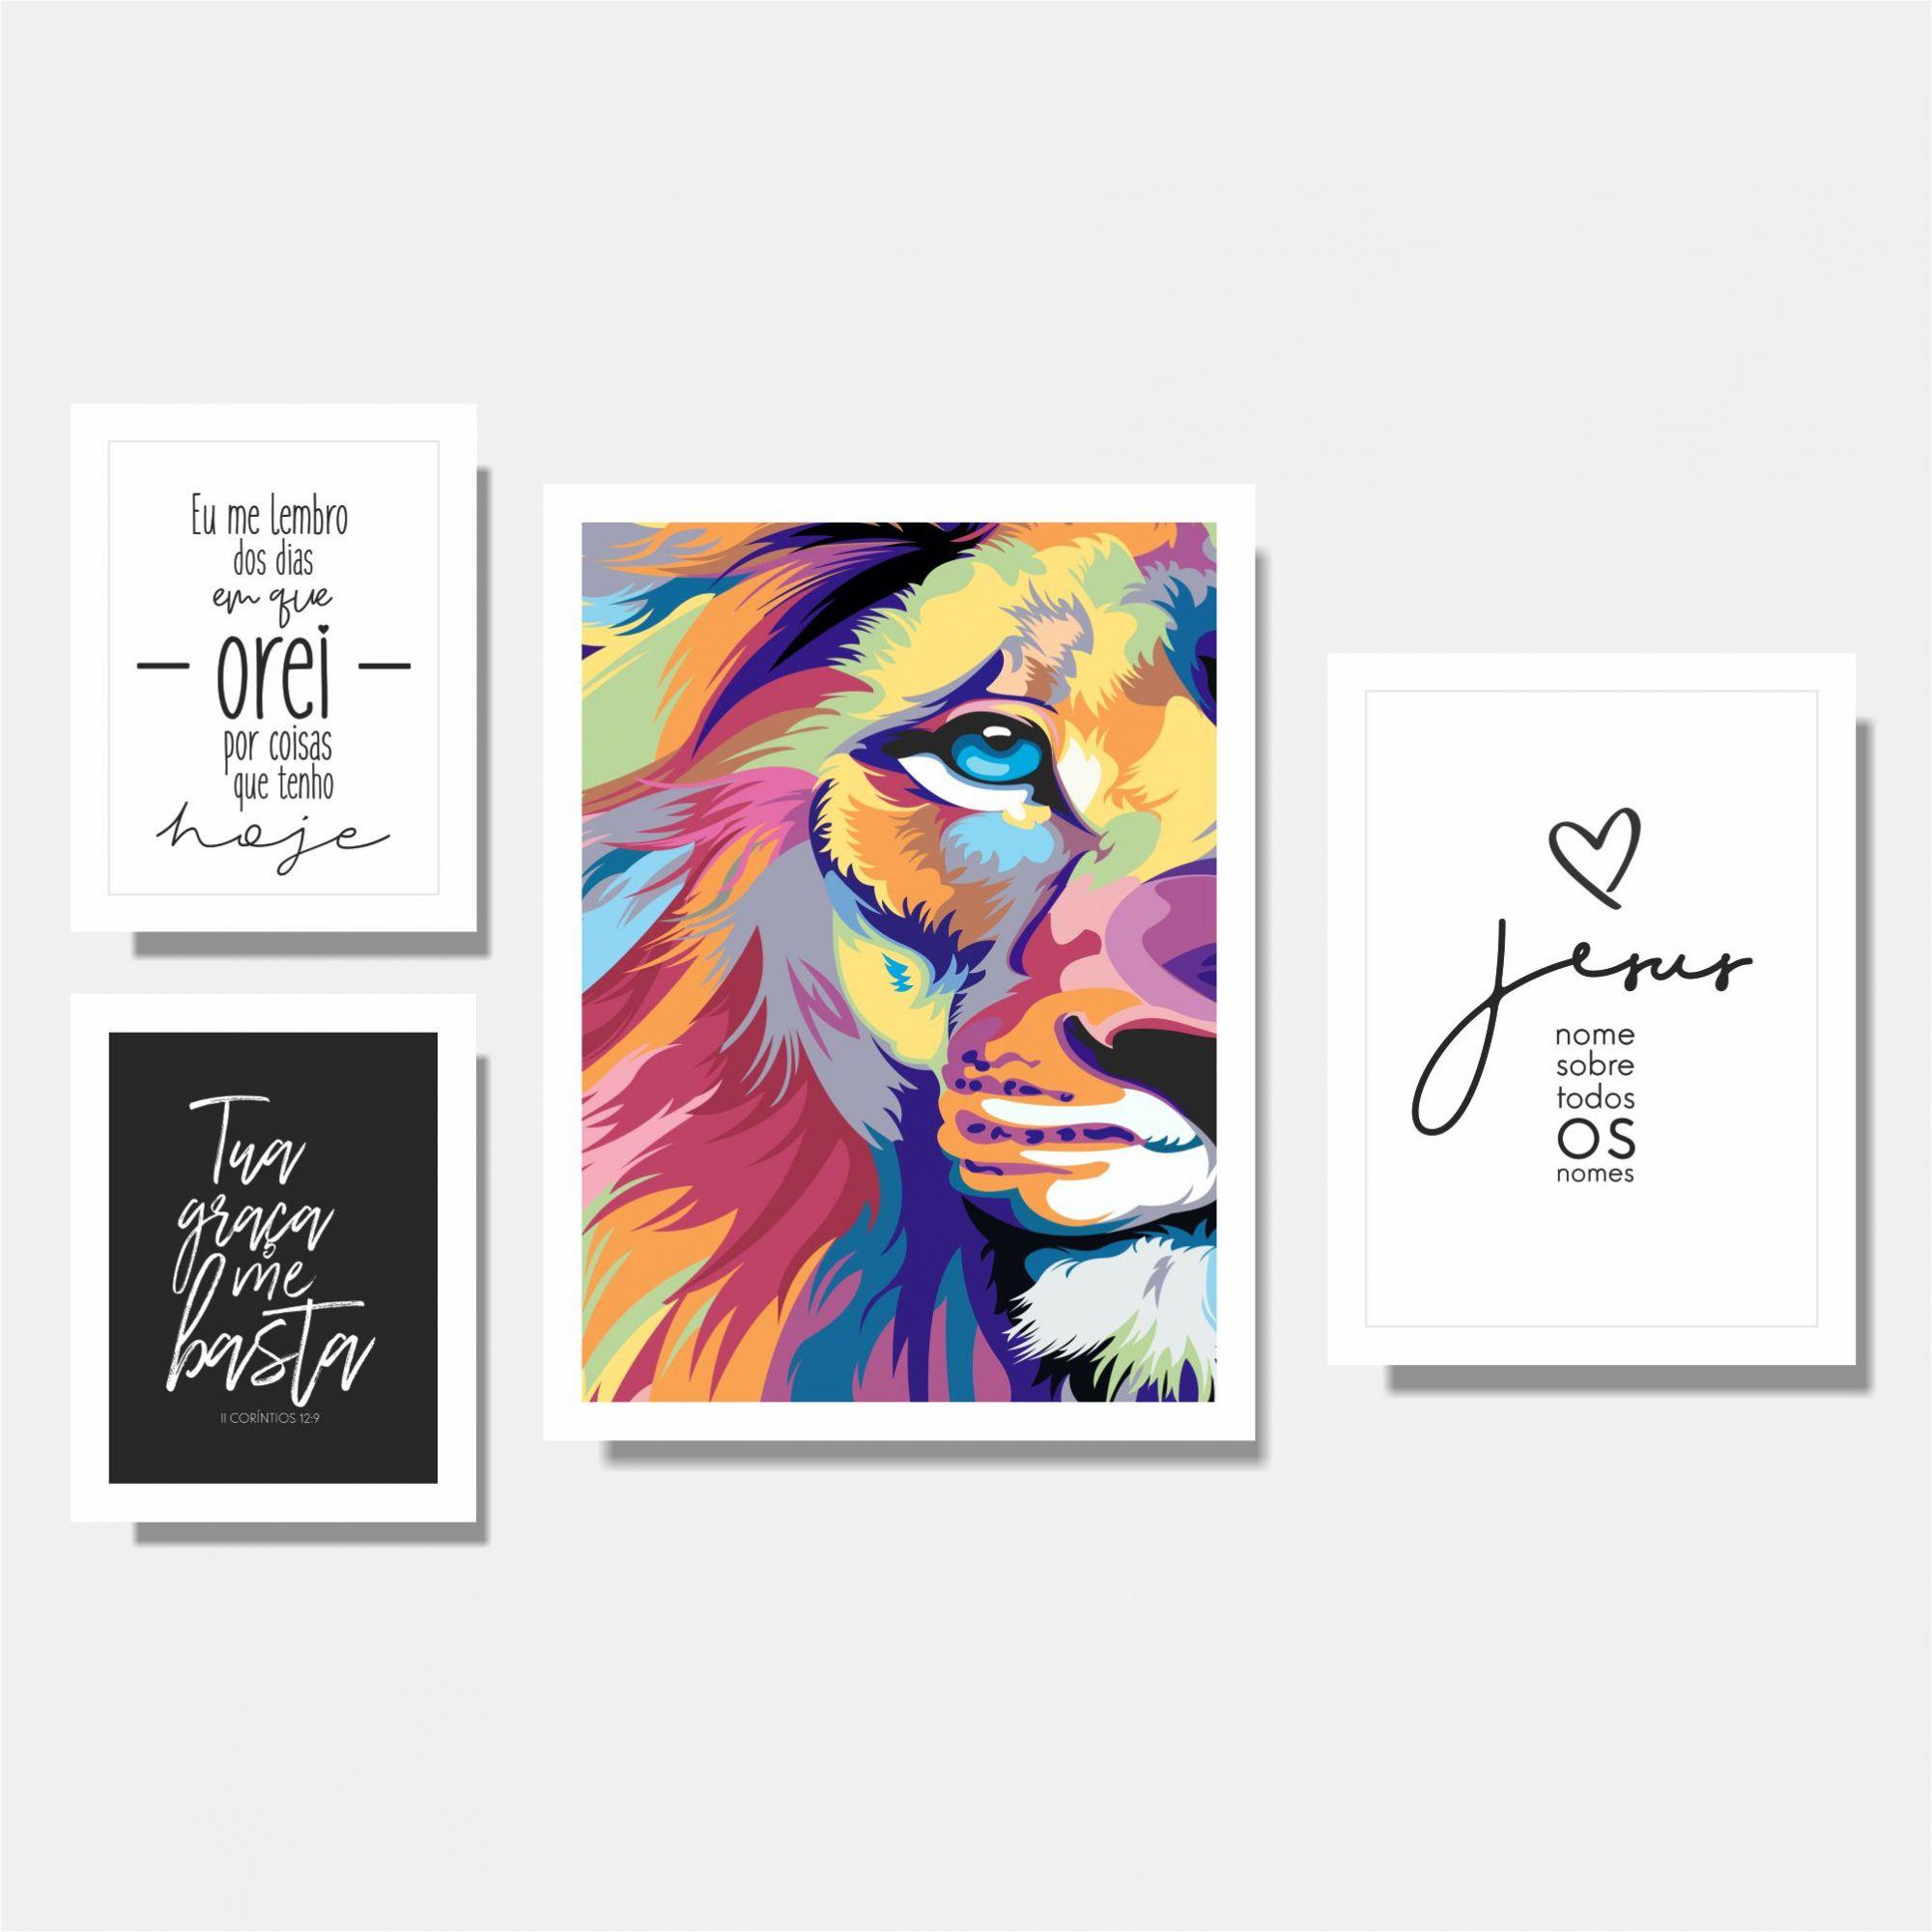 Kit Leão + Eu Me Lembro + Tua Graça  me Basta + Jesus